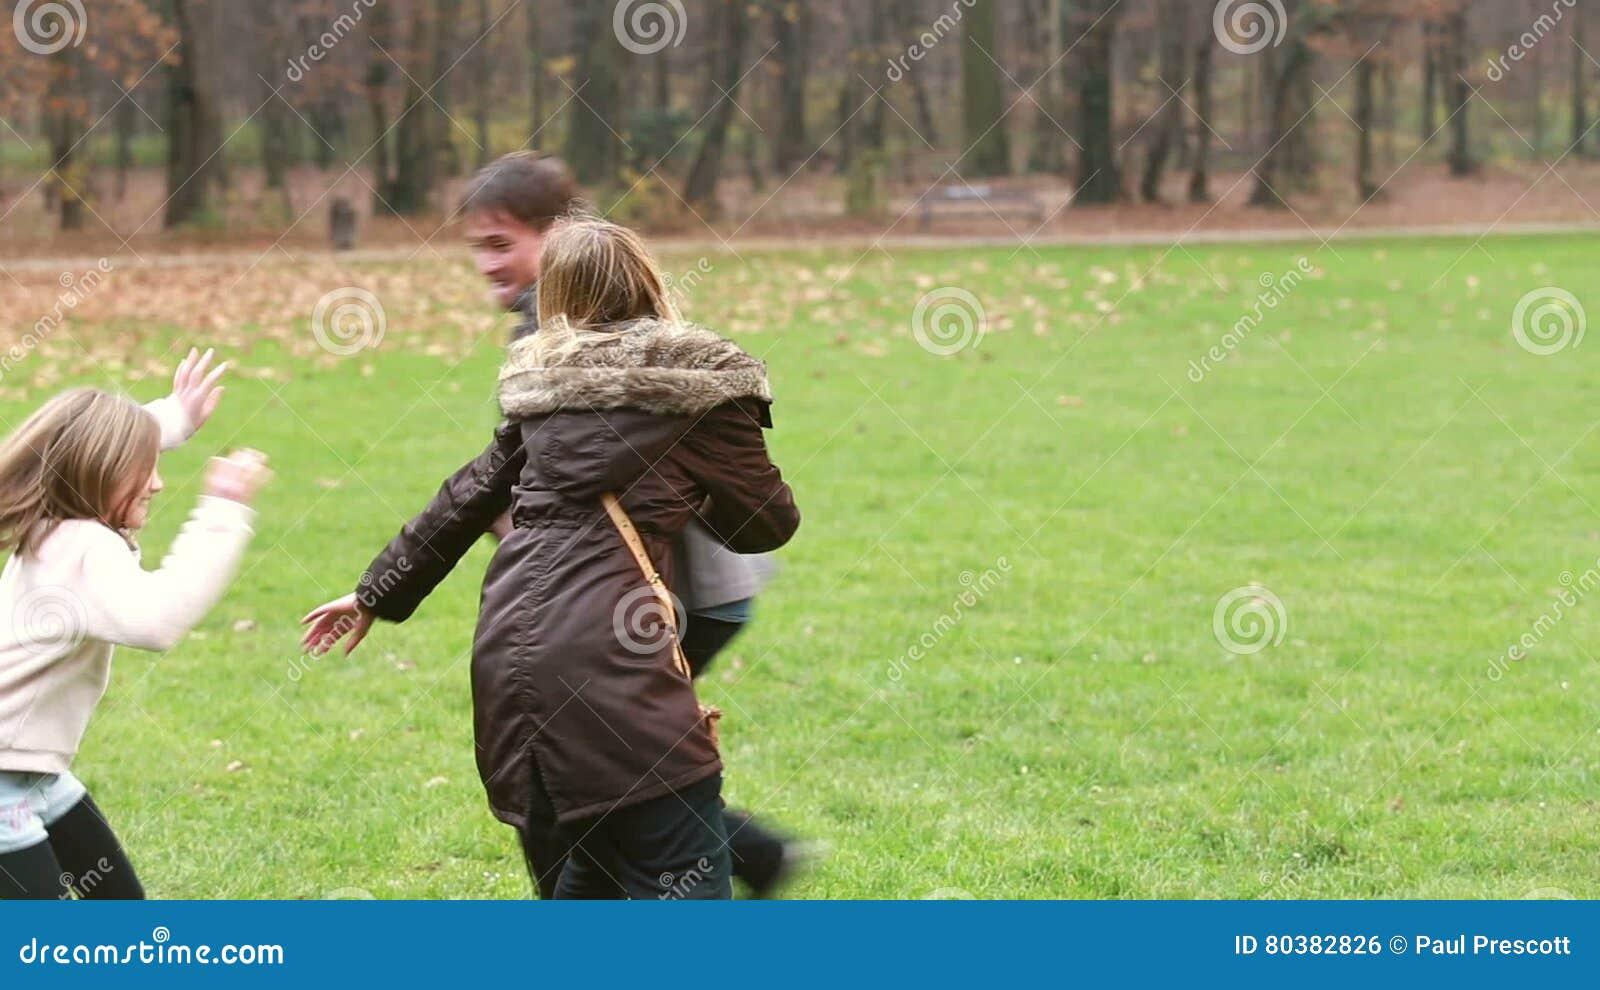 Mom Catches Daughter Ebony